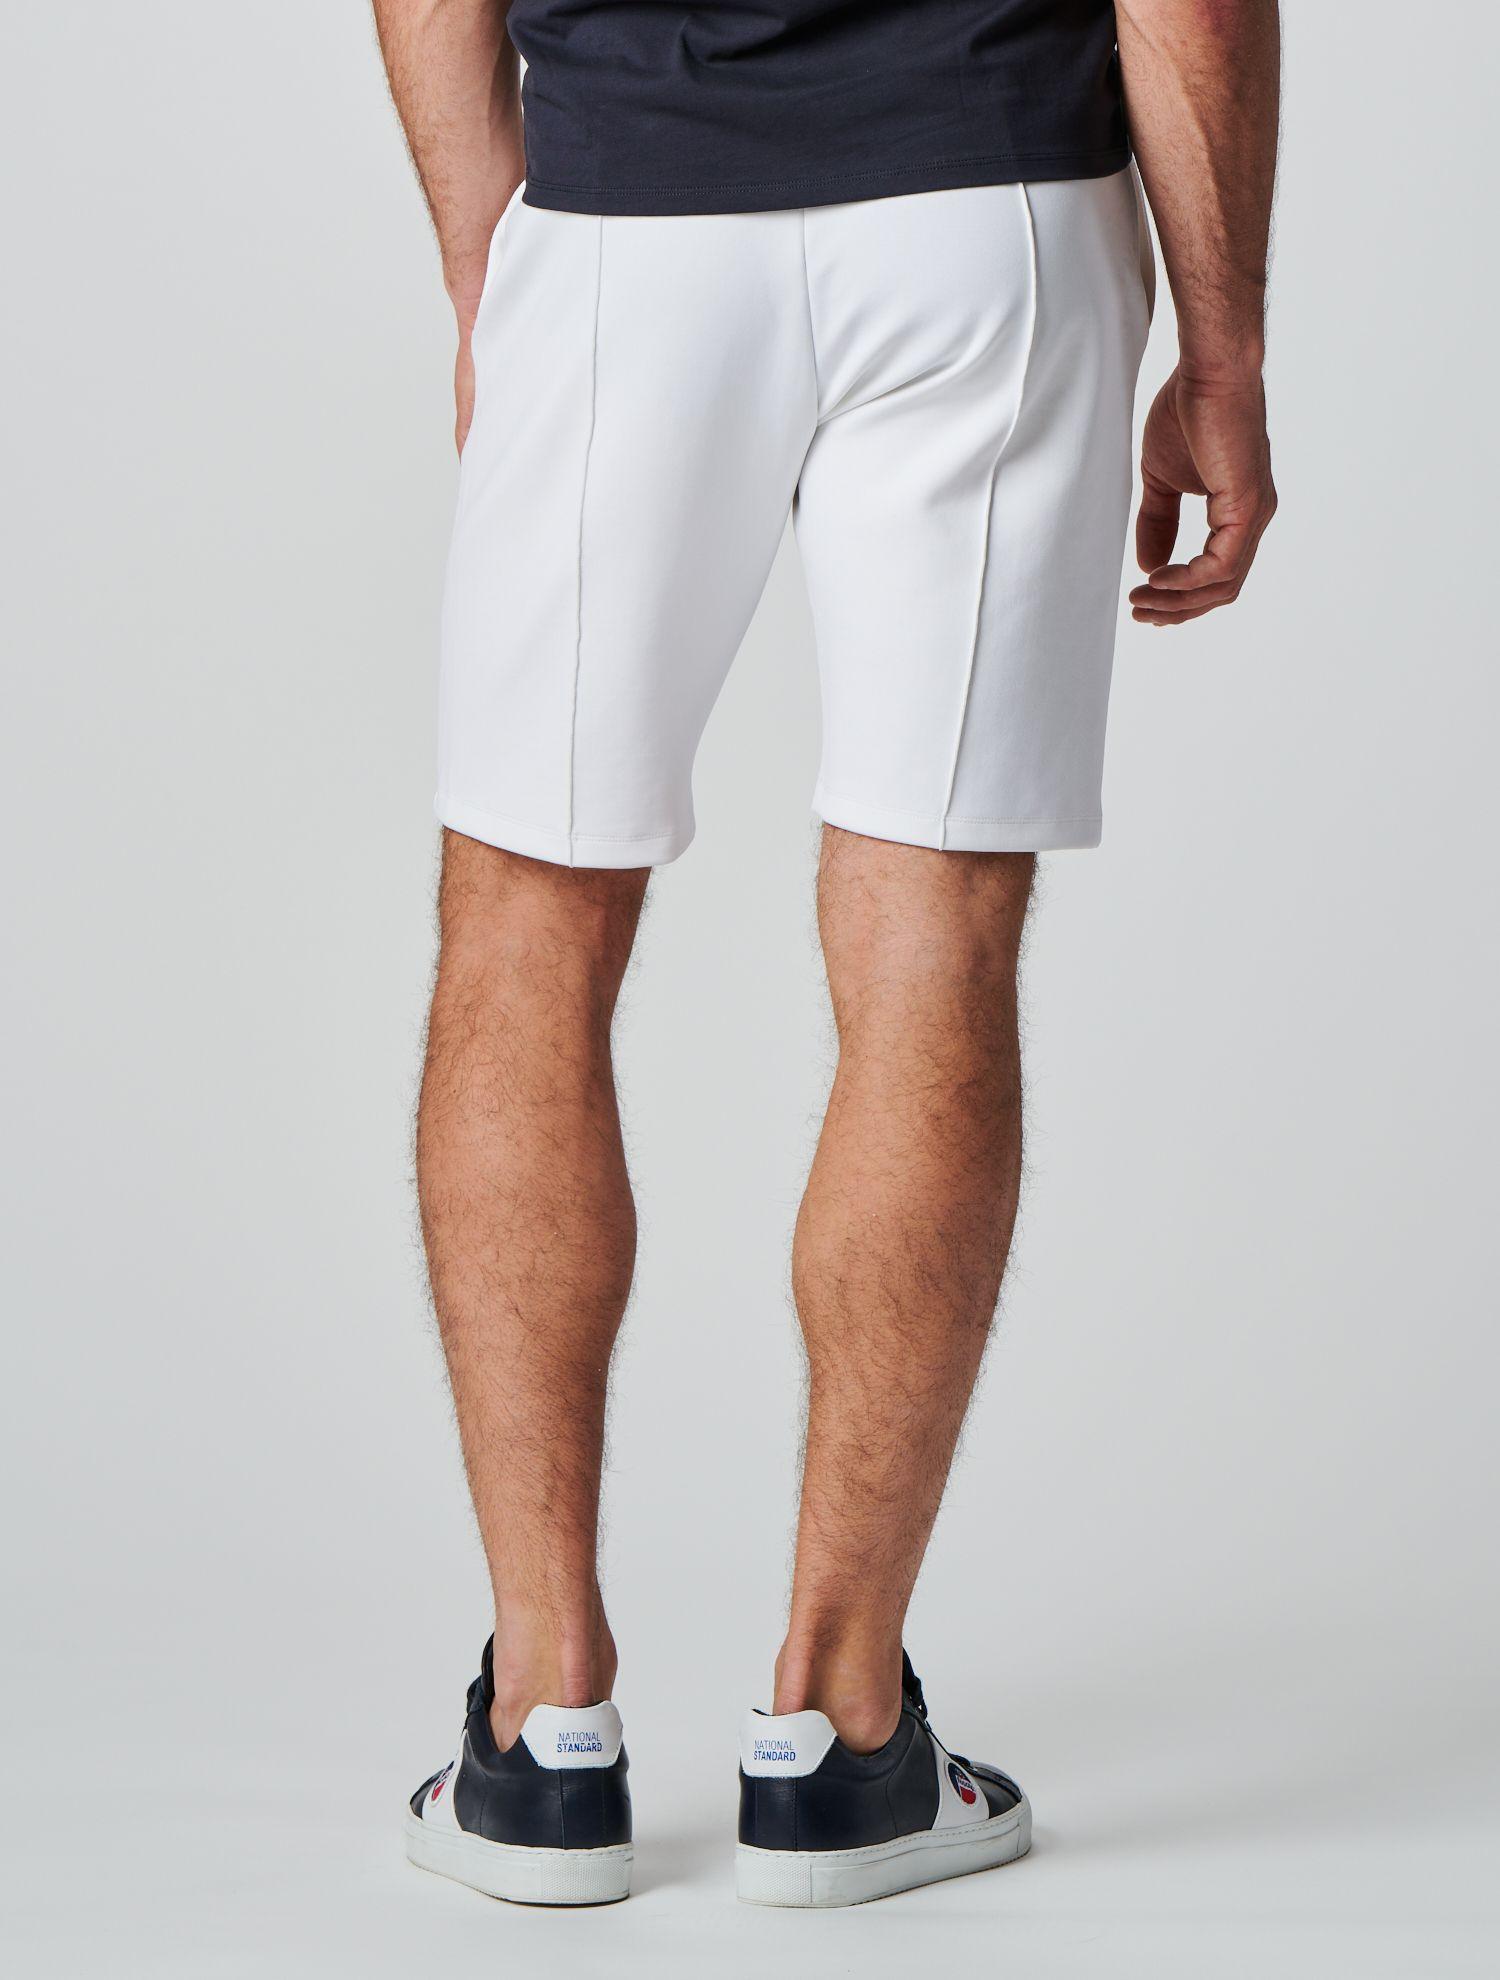 GASPARD PANTS